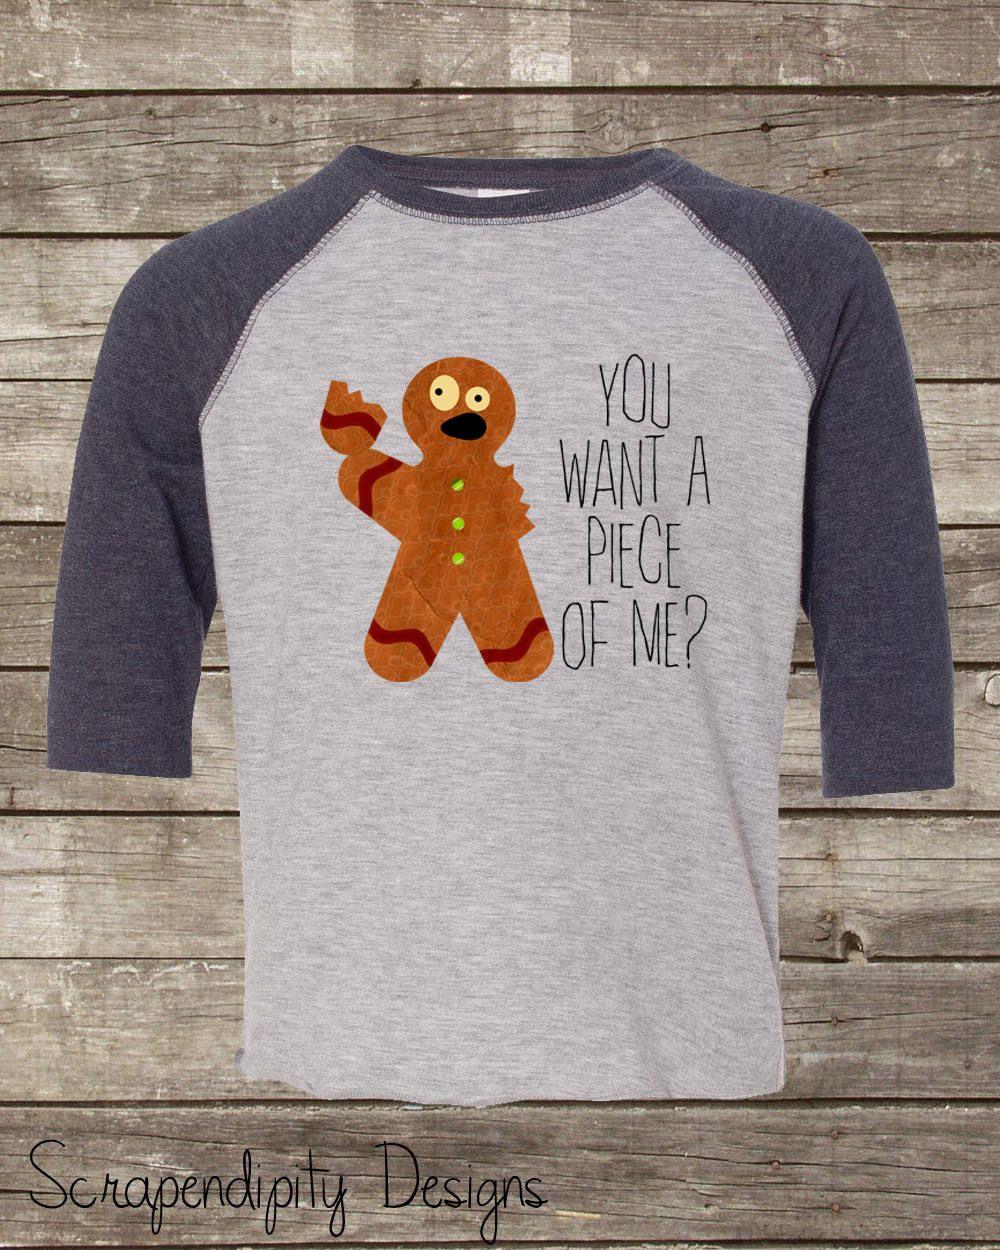 4ad10be0 Kids Christmas Shirt, Gingerbread Man Shirt, Funny Christmas Tshirt, Christmas  Shirt for Men, Boys Christmas Tshirt, Kids Christmas Pajamas